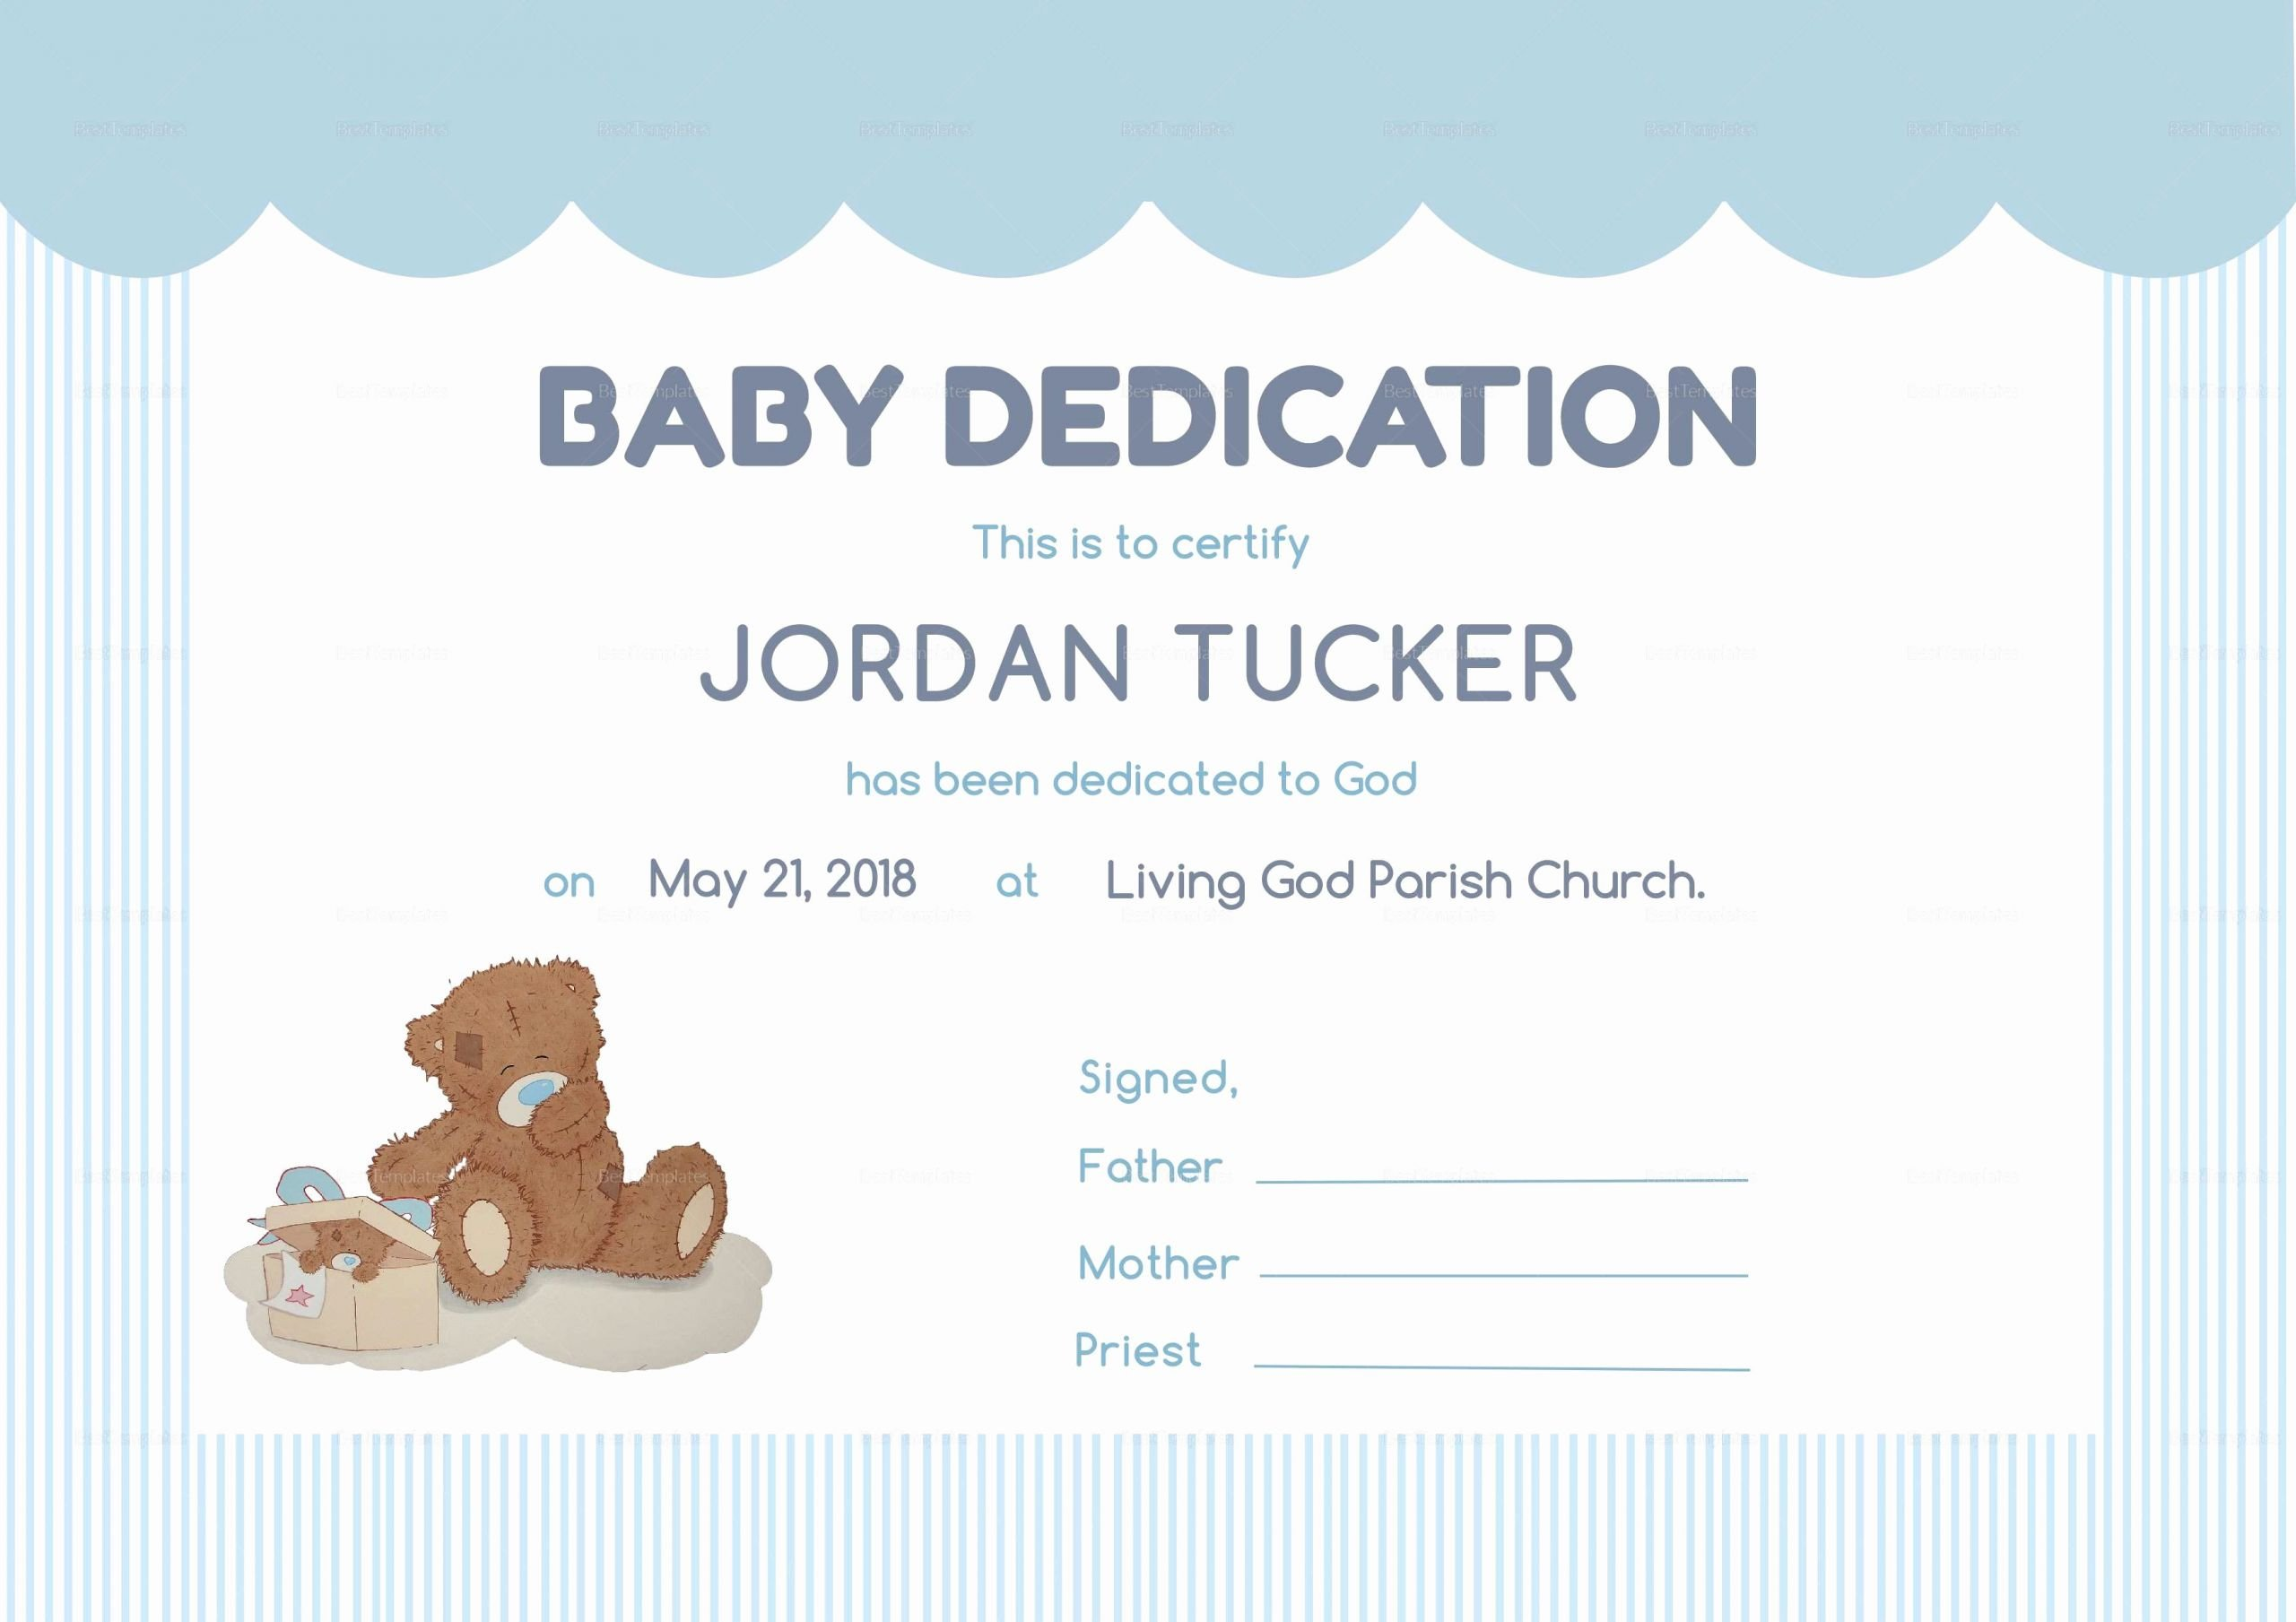 Child Dedication Certificate Editable Luxury Child Dedication Certificate Clean Baby Dedication